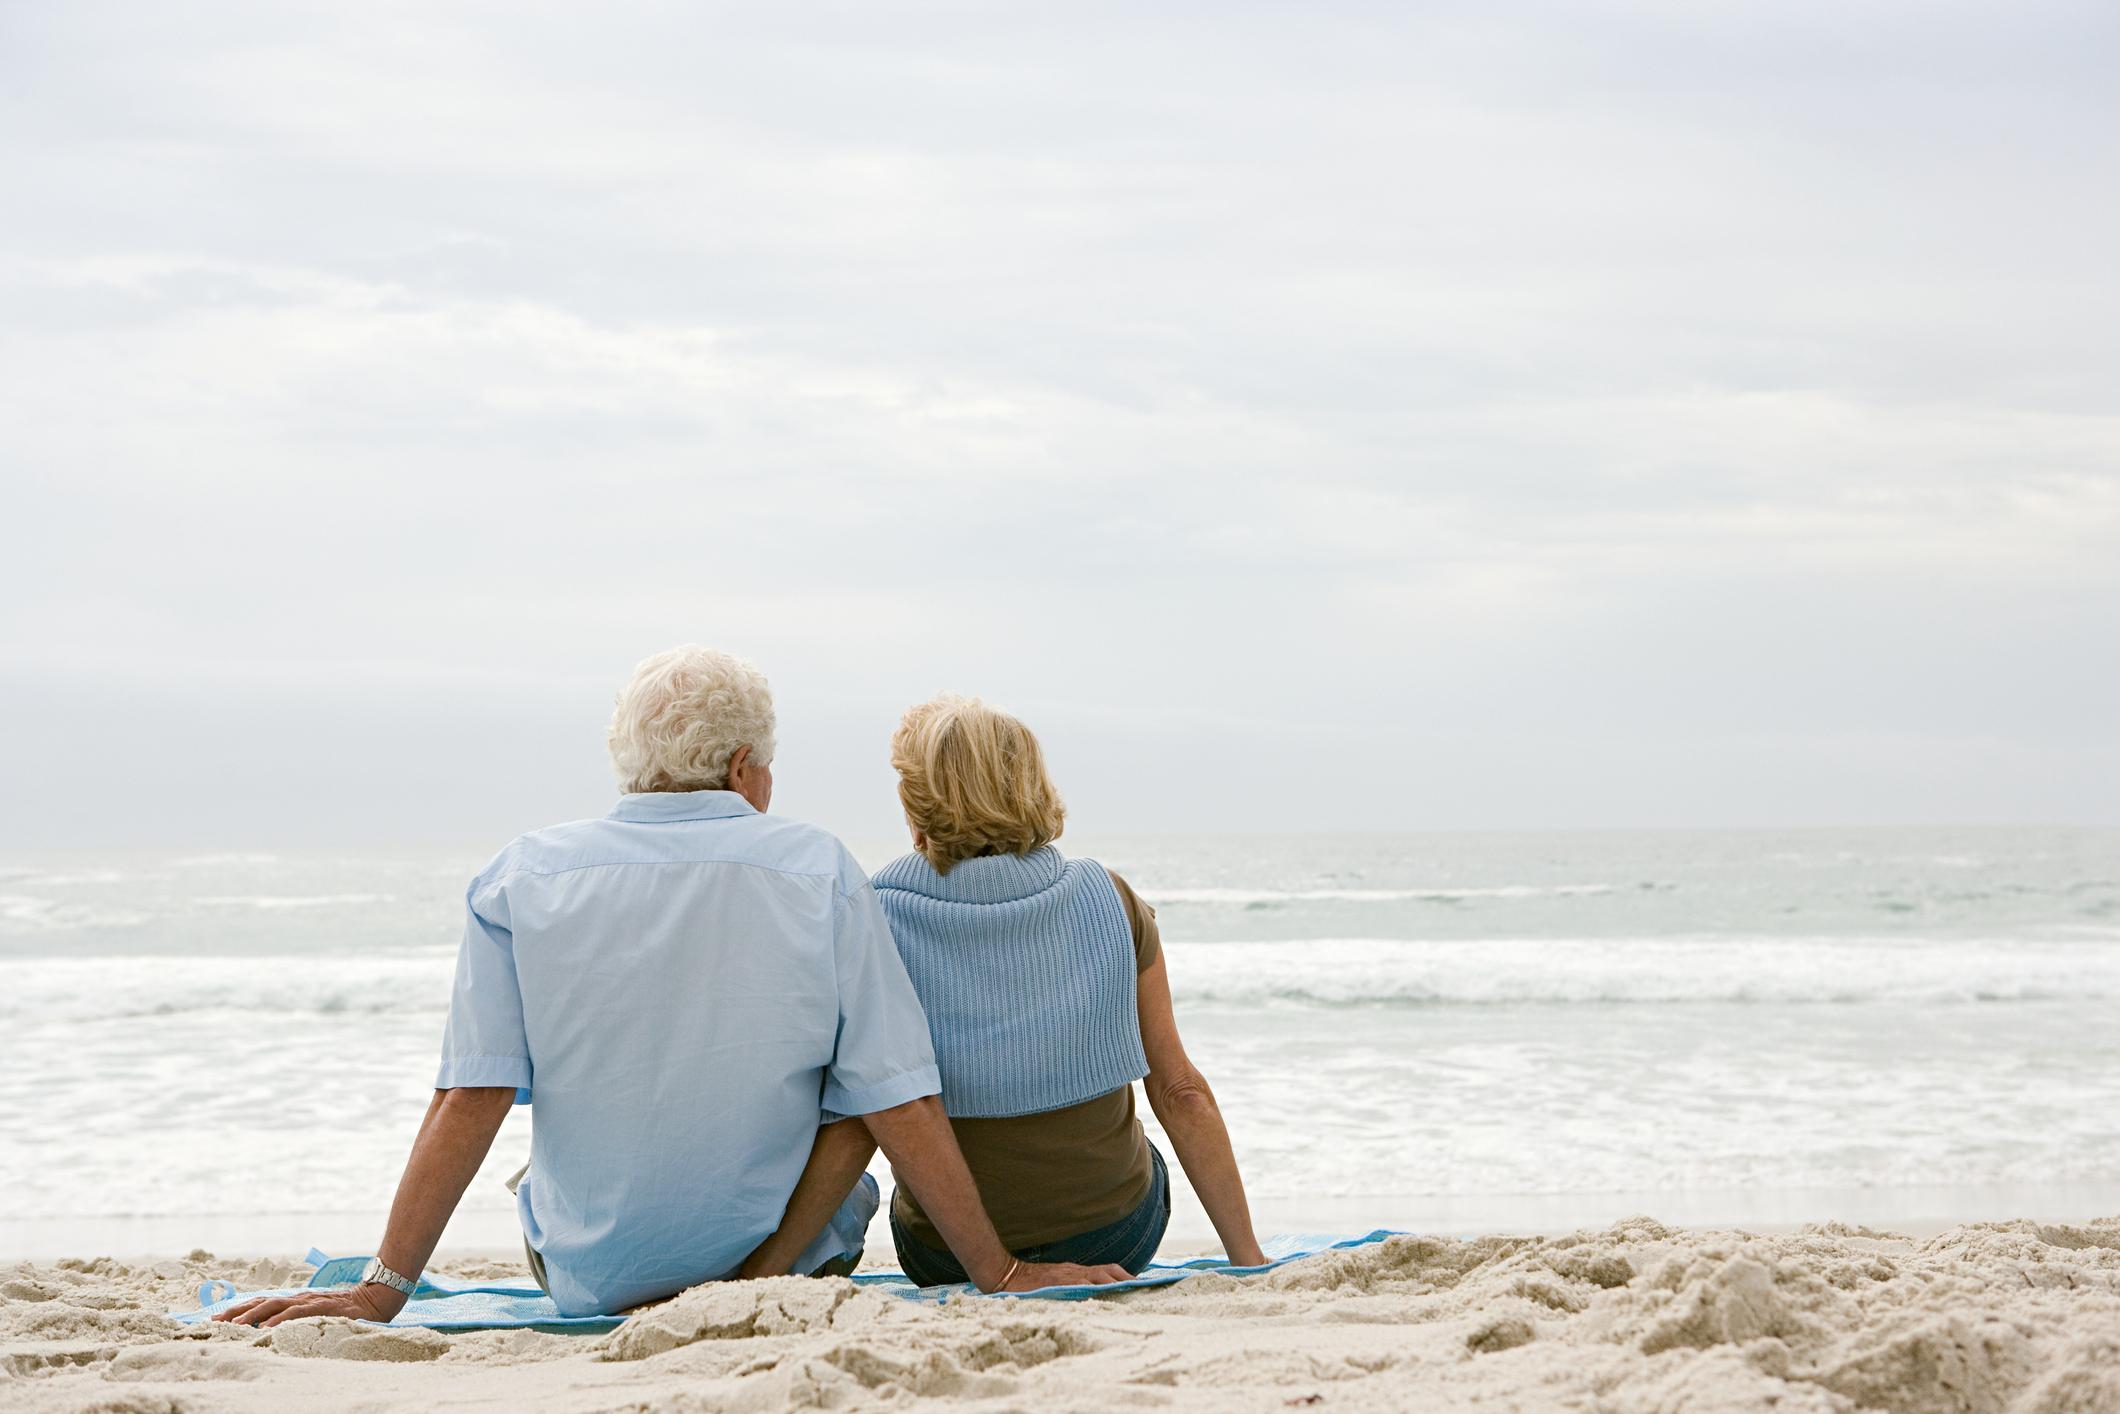 Senior couple sitting on the beach, facing the ocean